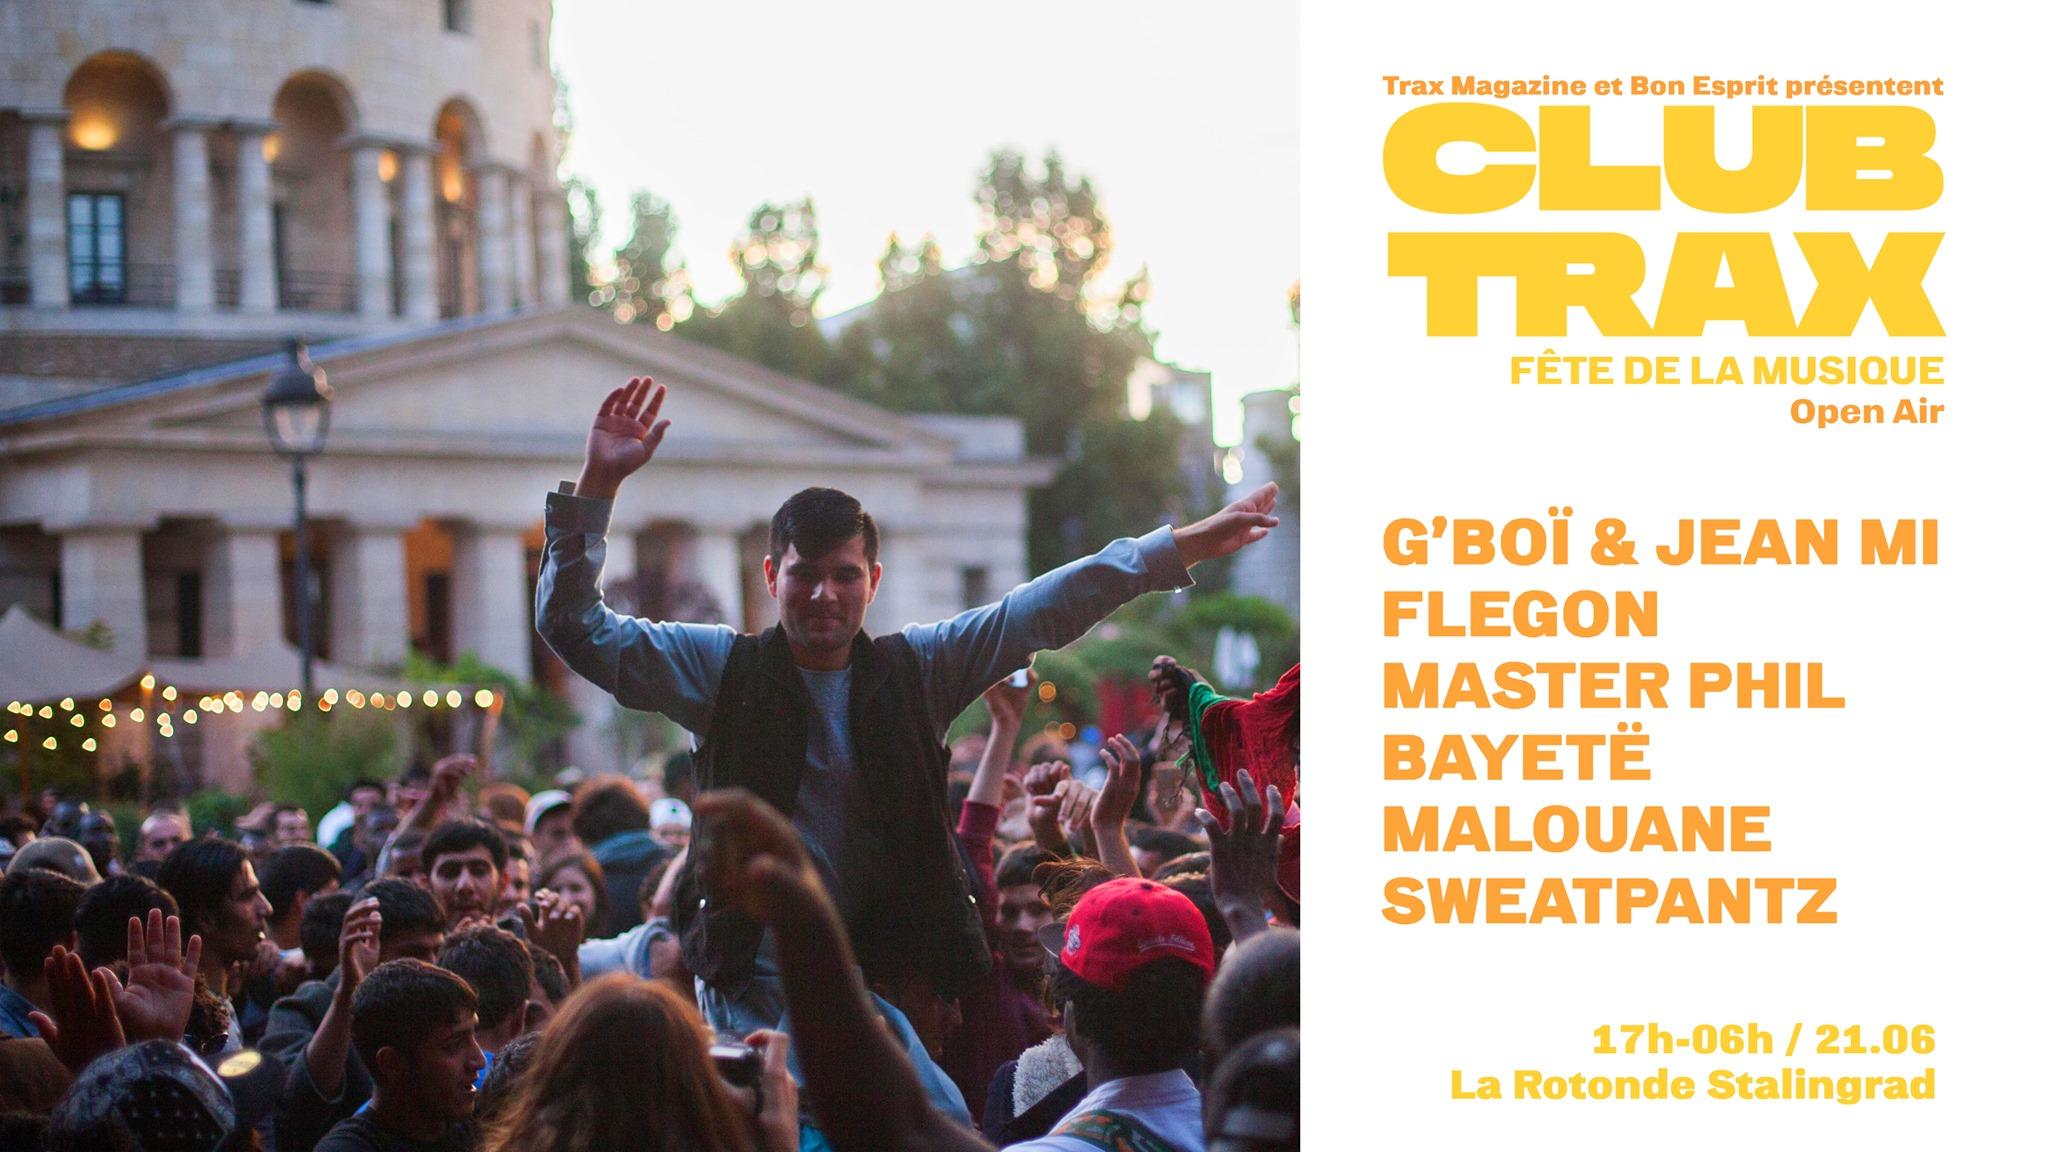 event-club-trax-rotonde-fete-de-la-musique-culturclub.jpg